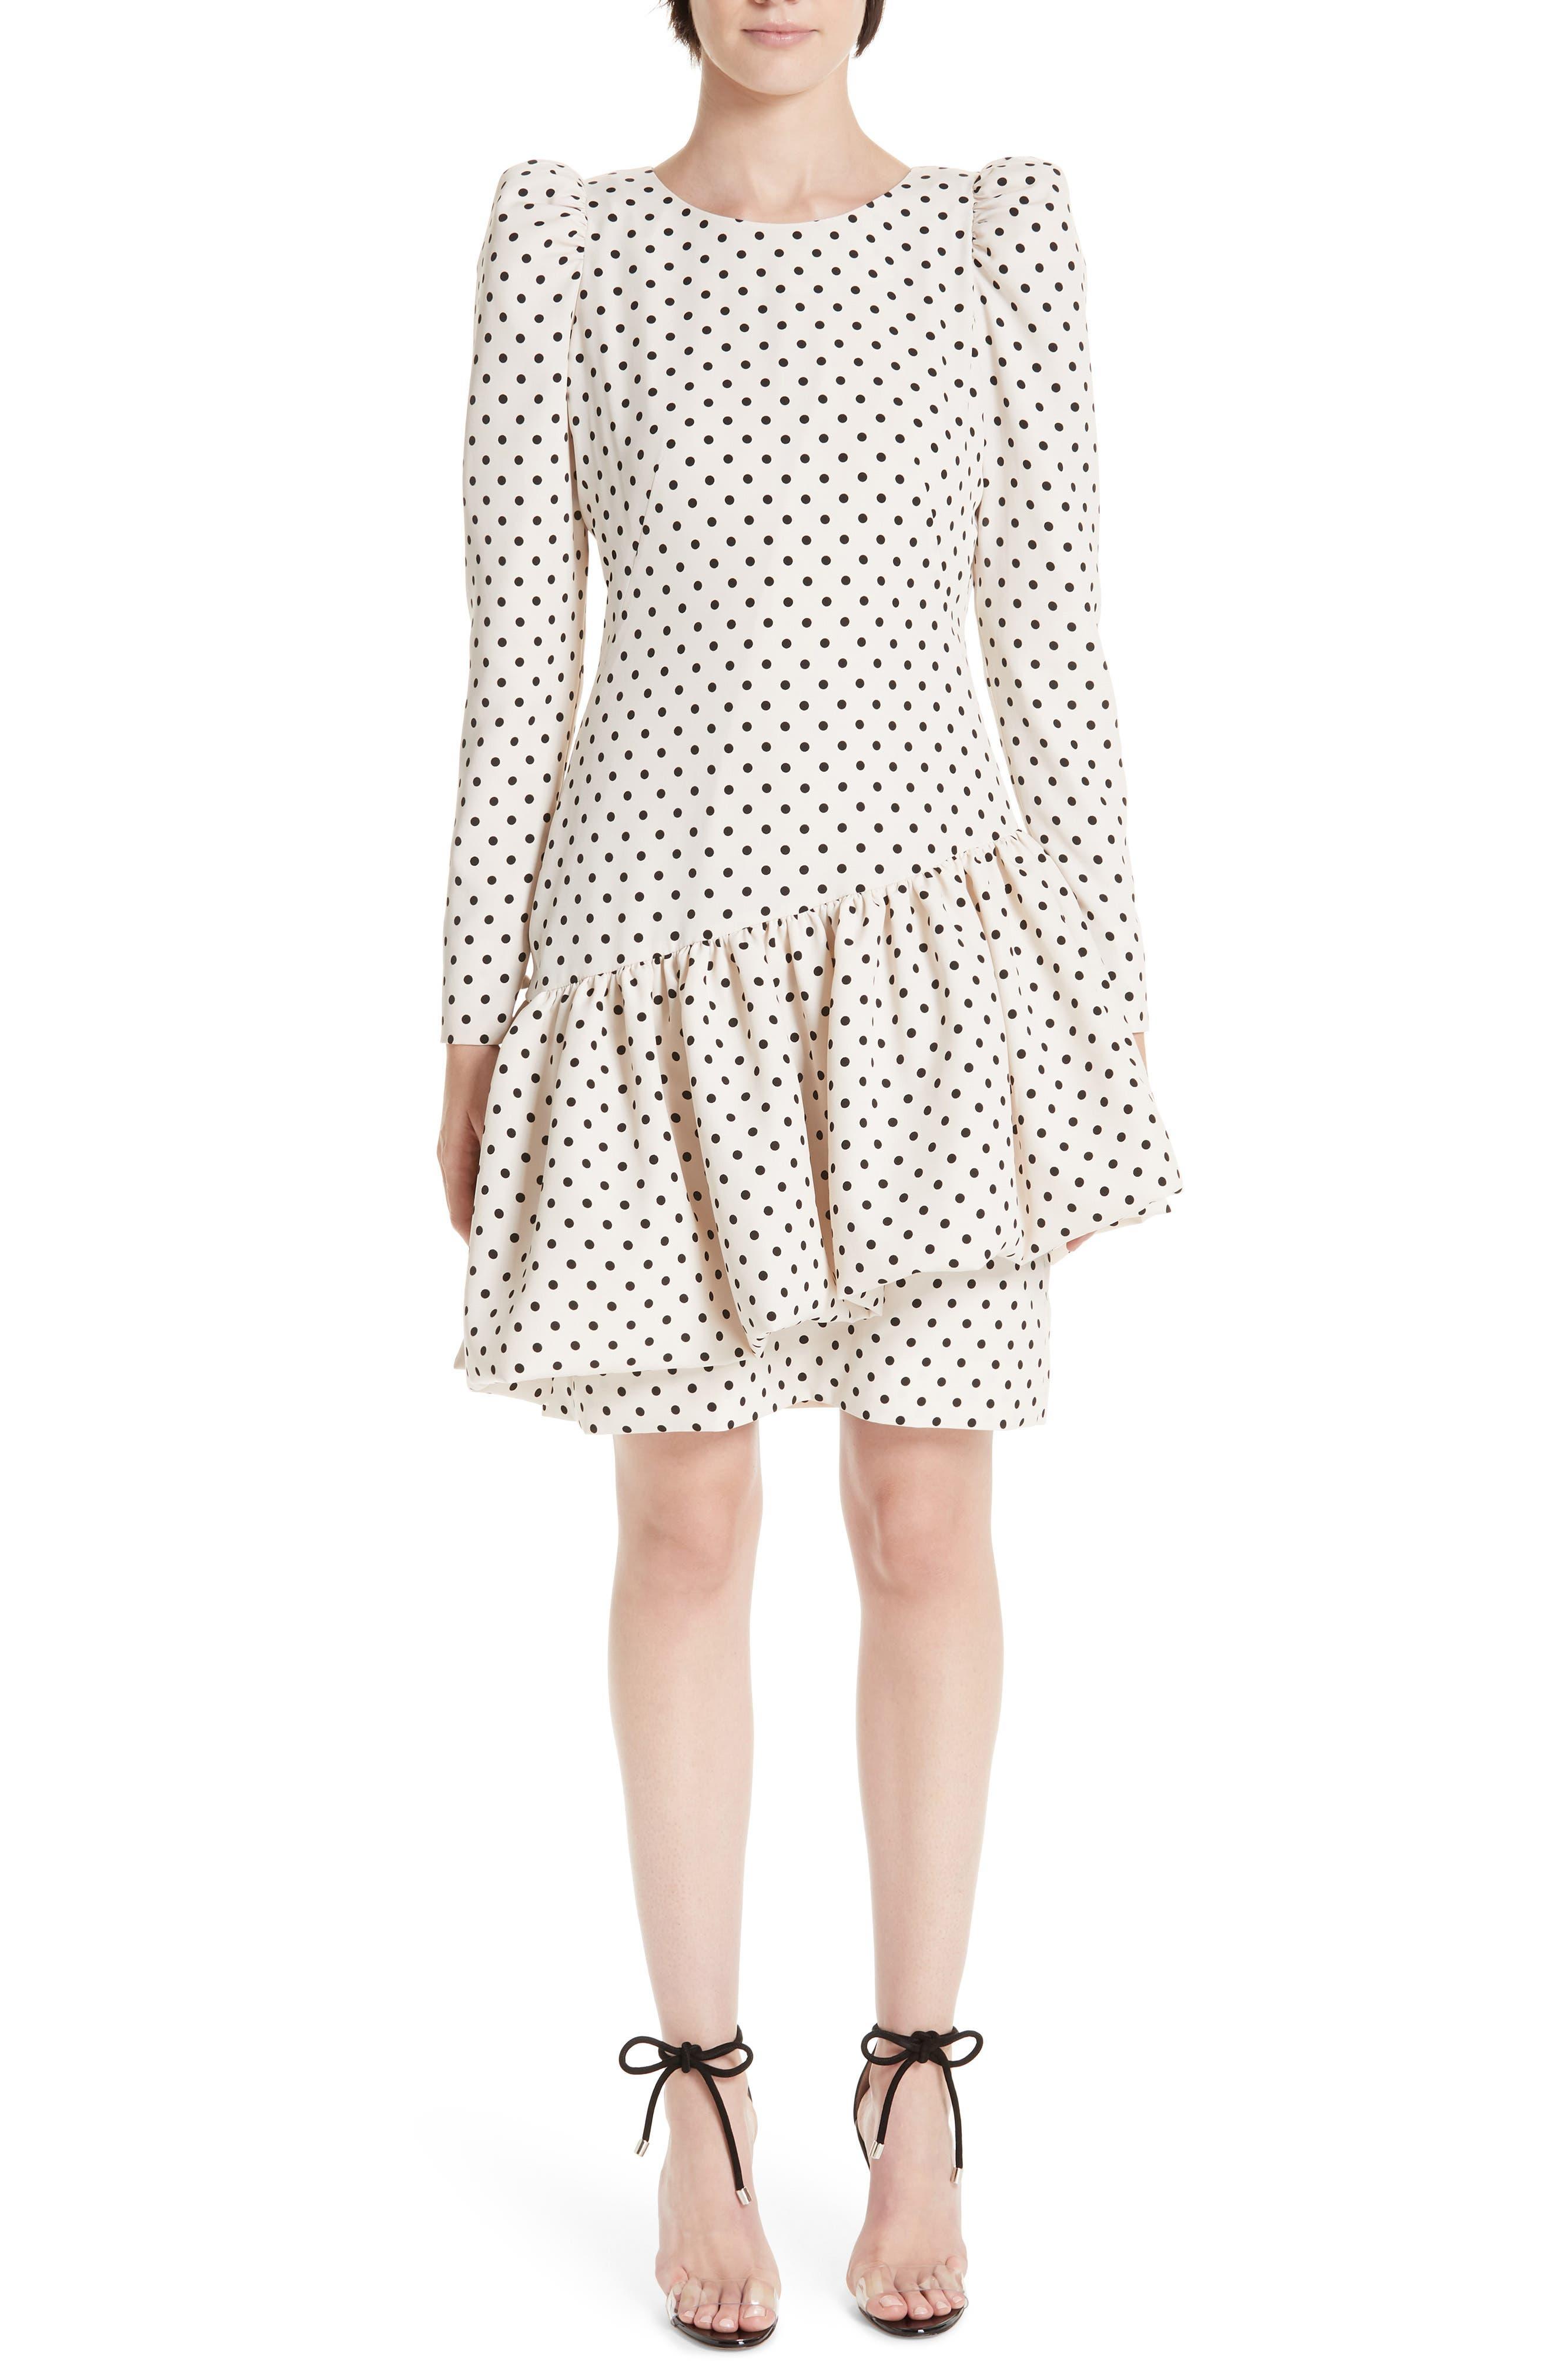 c5cfe0da59 Women s Designer Dresses